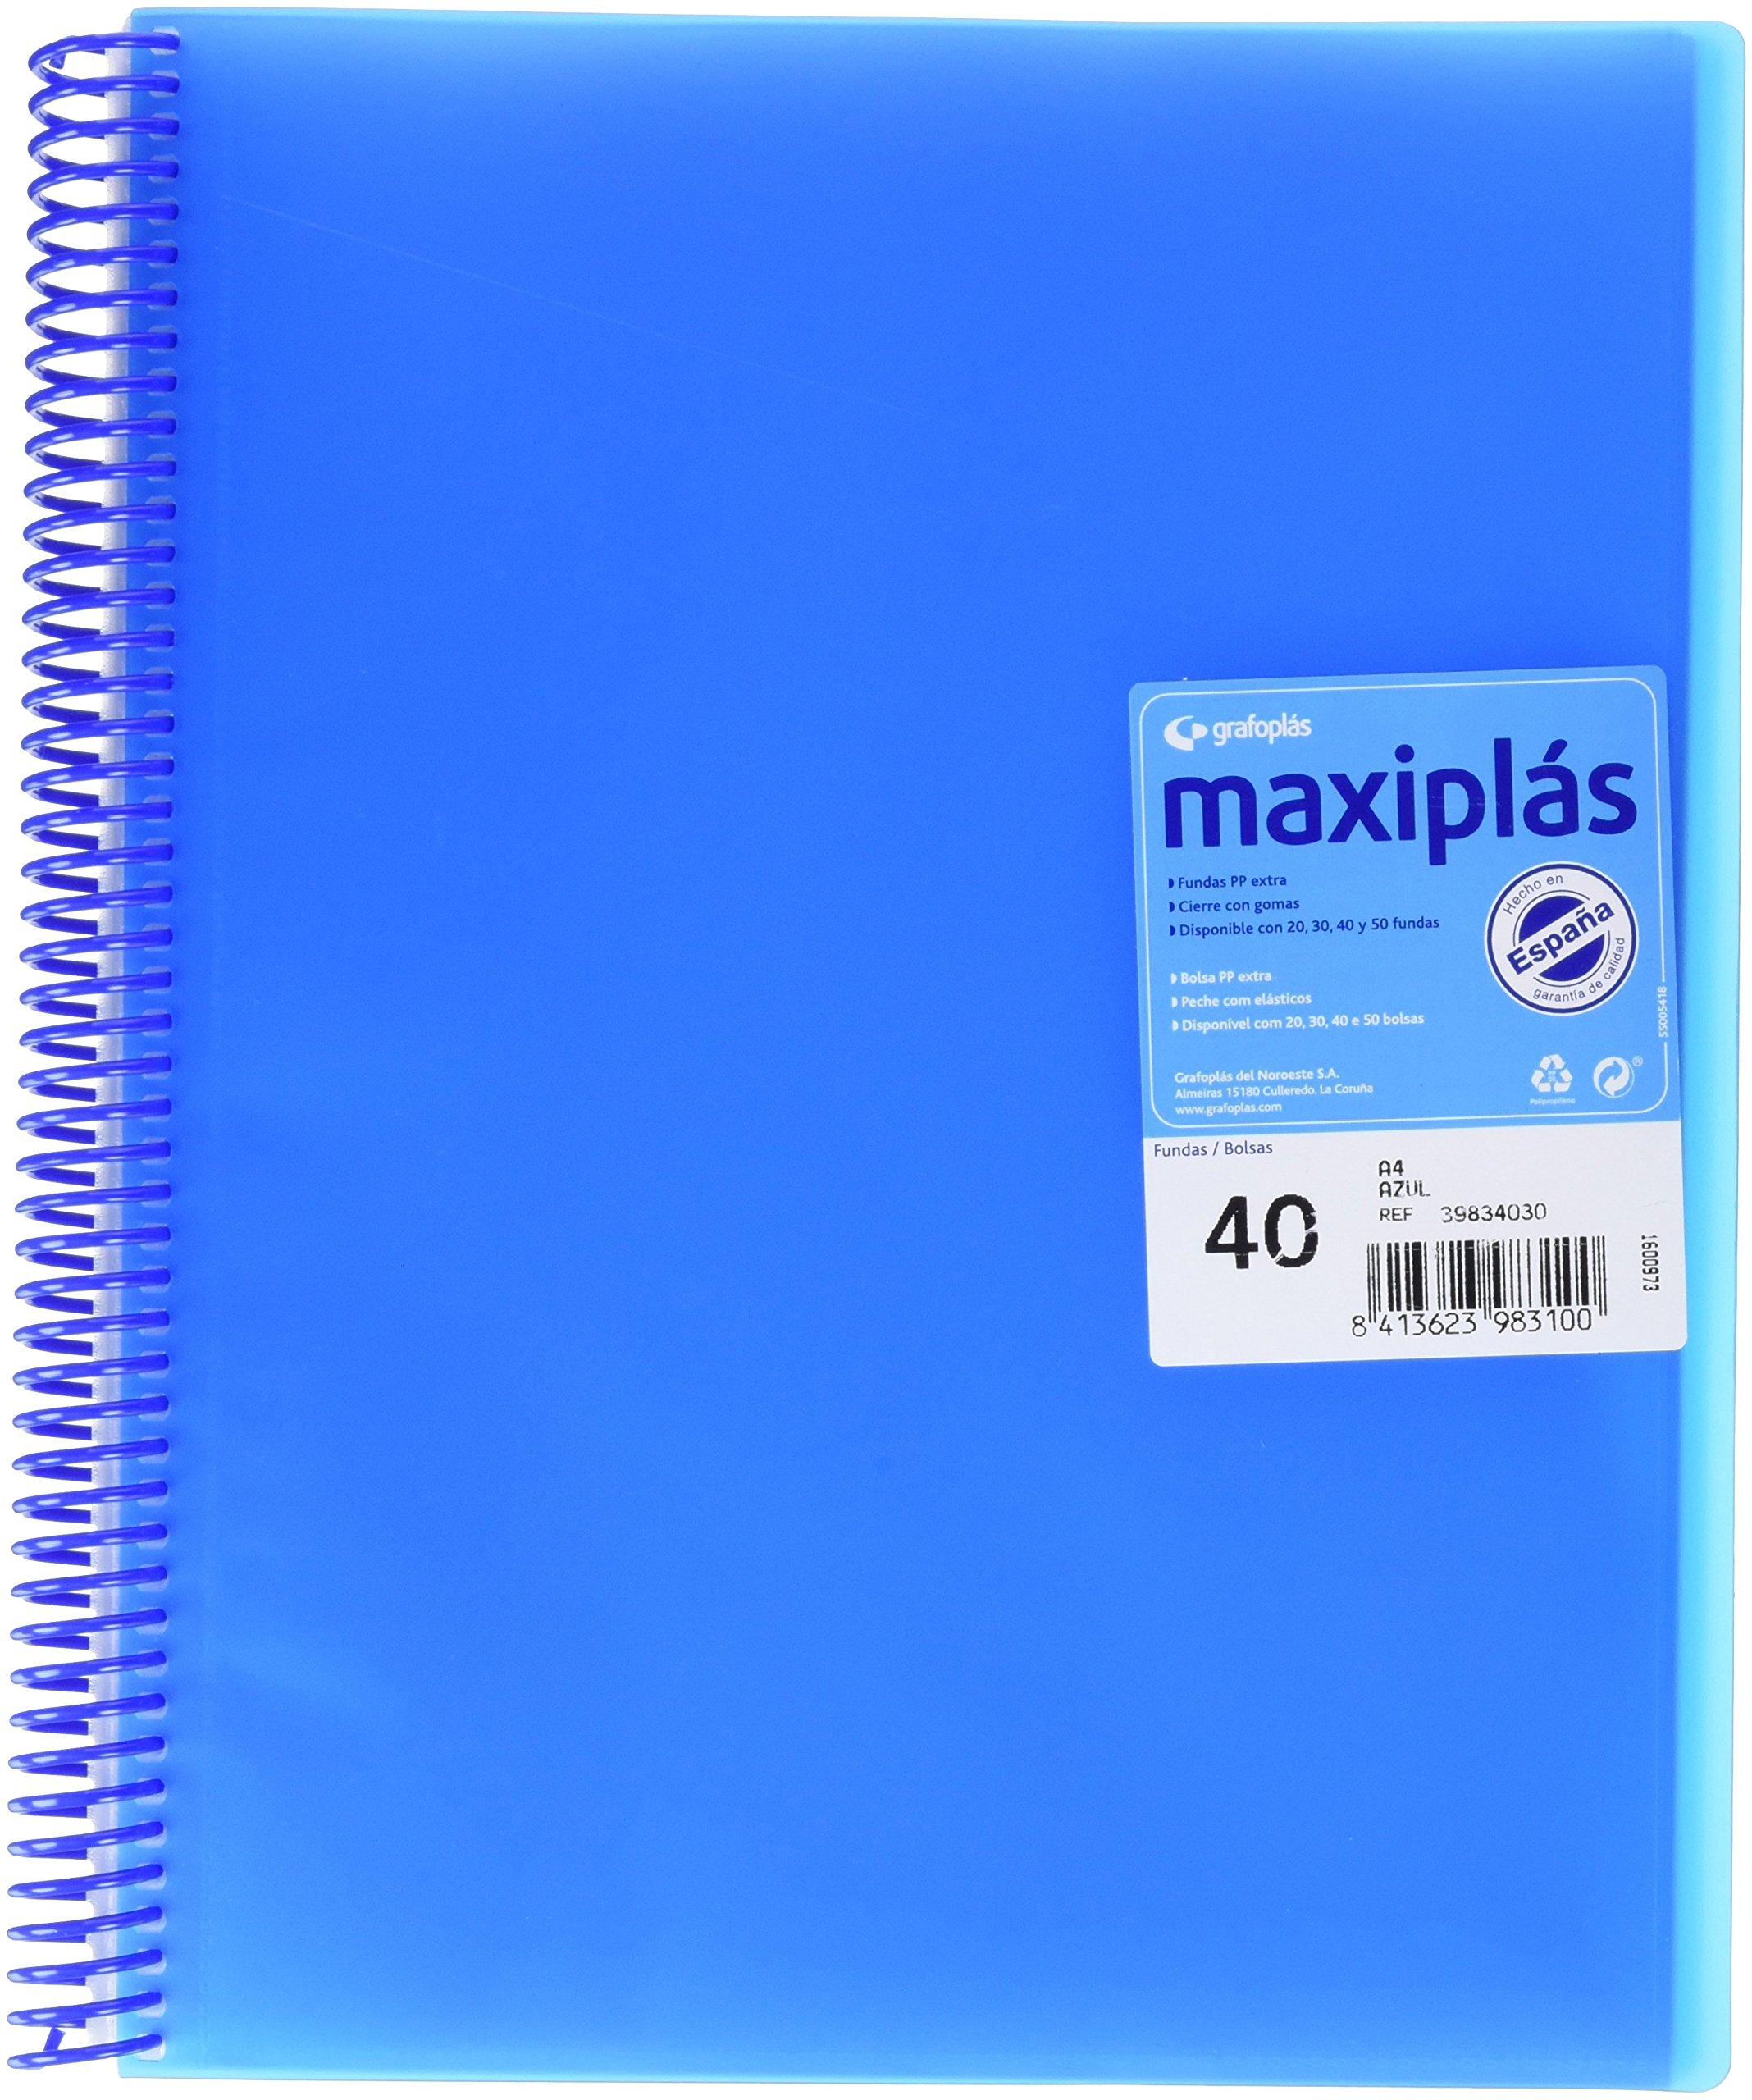 Grafoplás 39834030-Carpeta con 40 fundas A4 con sobre. Color azul: Amazon.es: Oficina y papelería